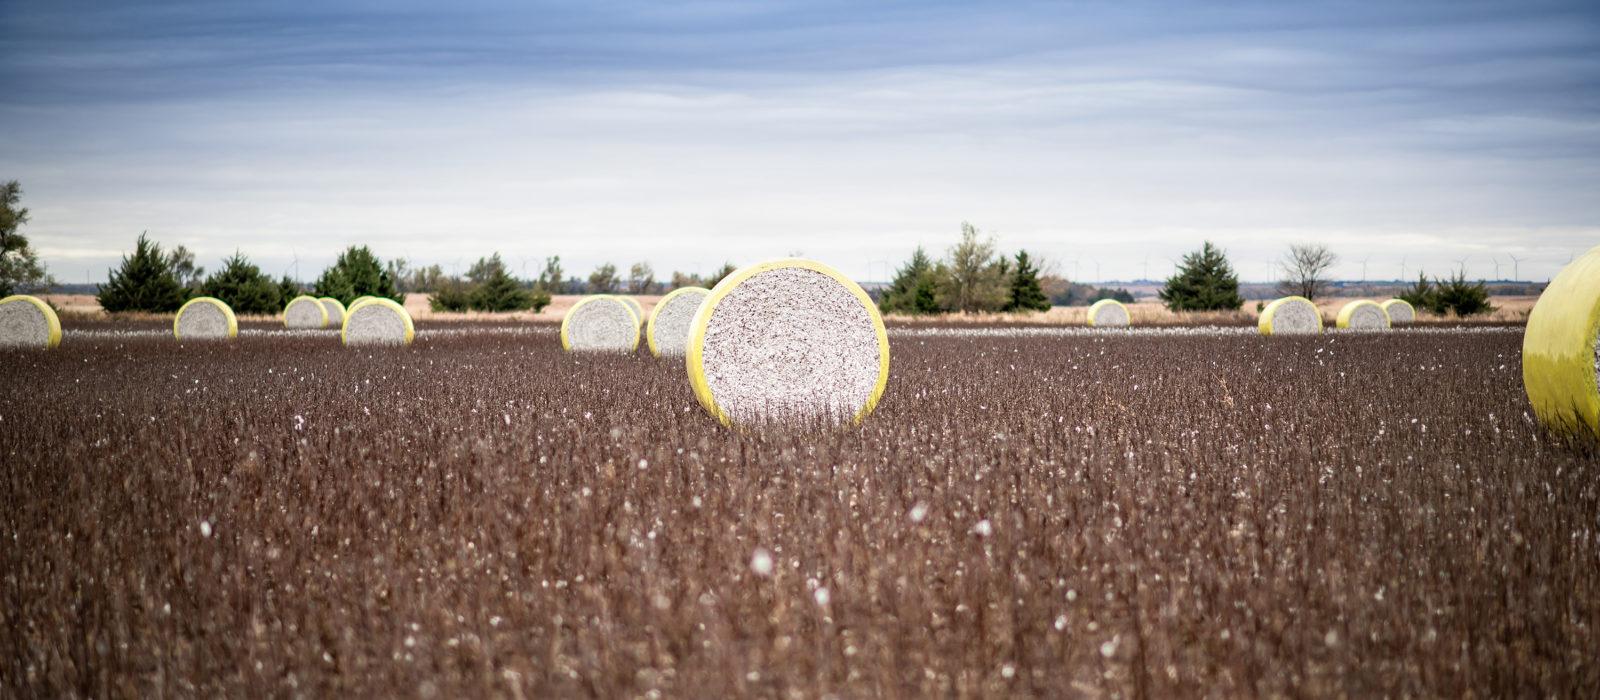 wheels of cotton harvest